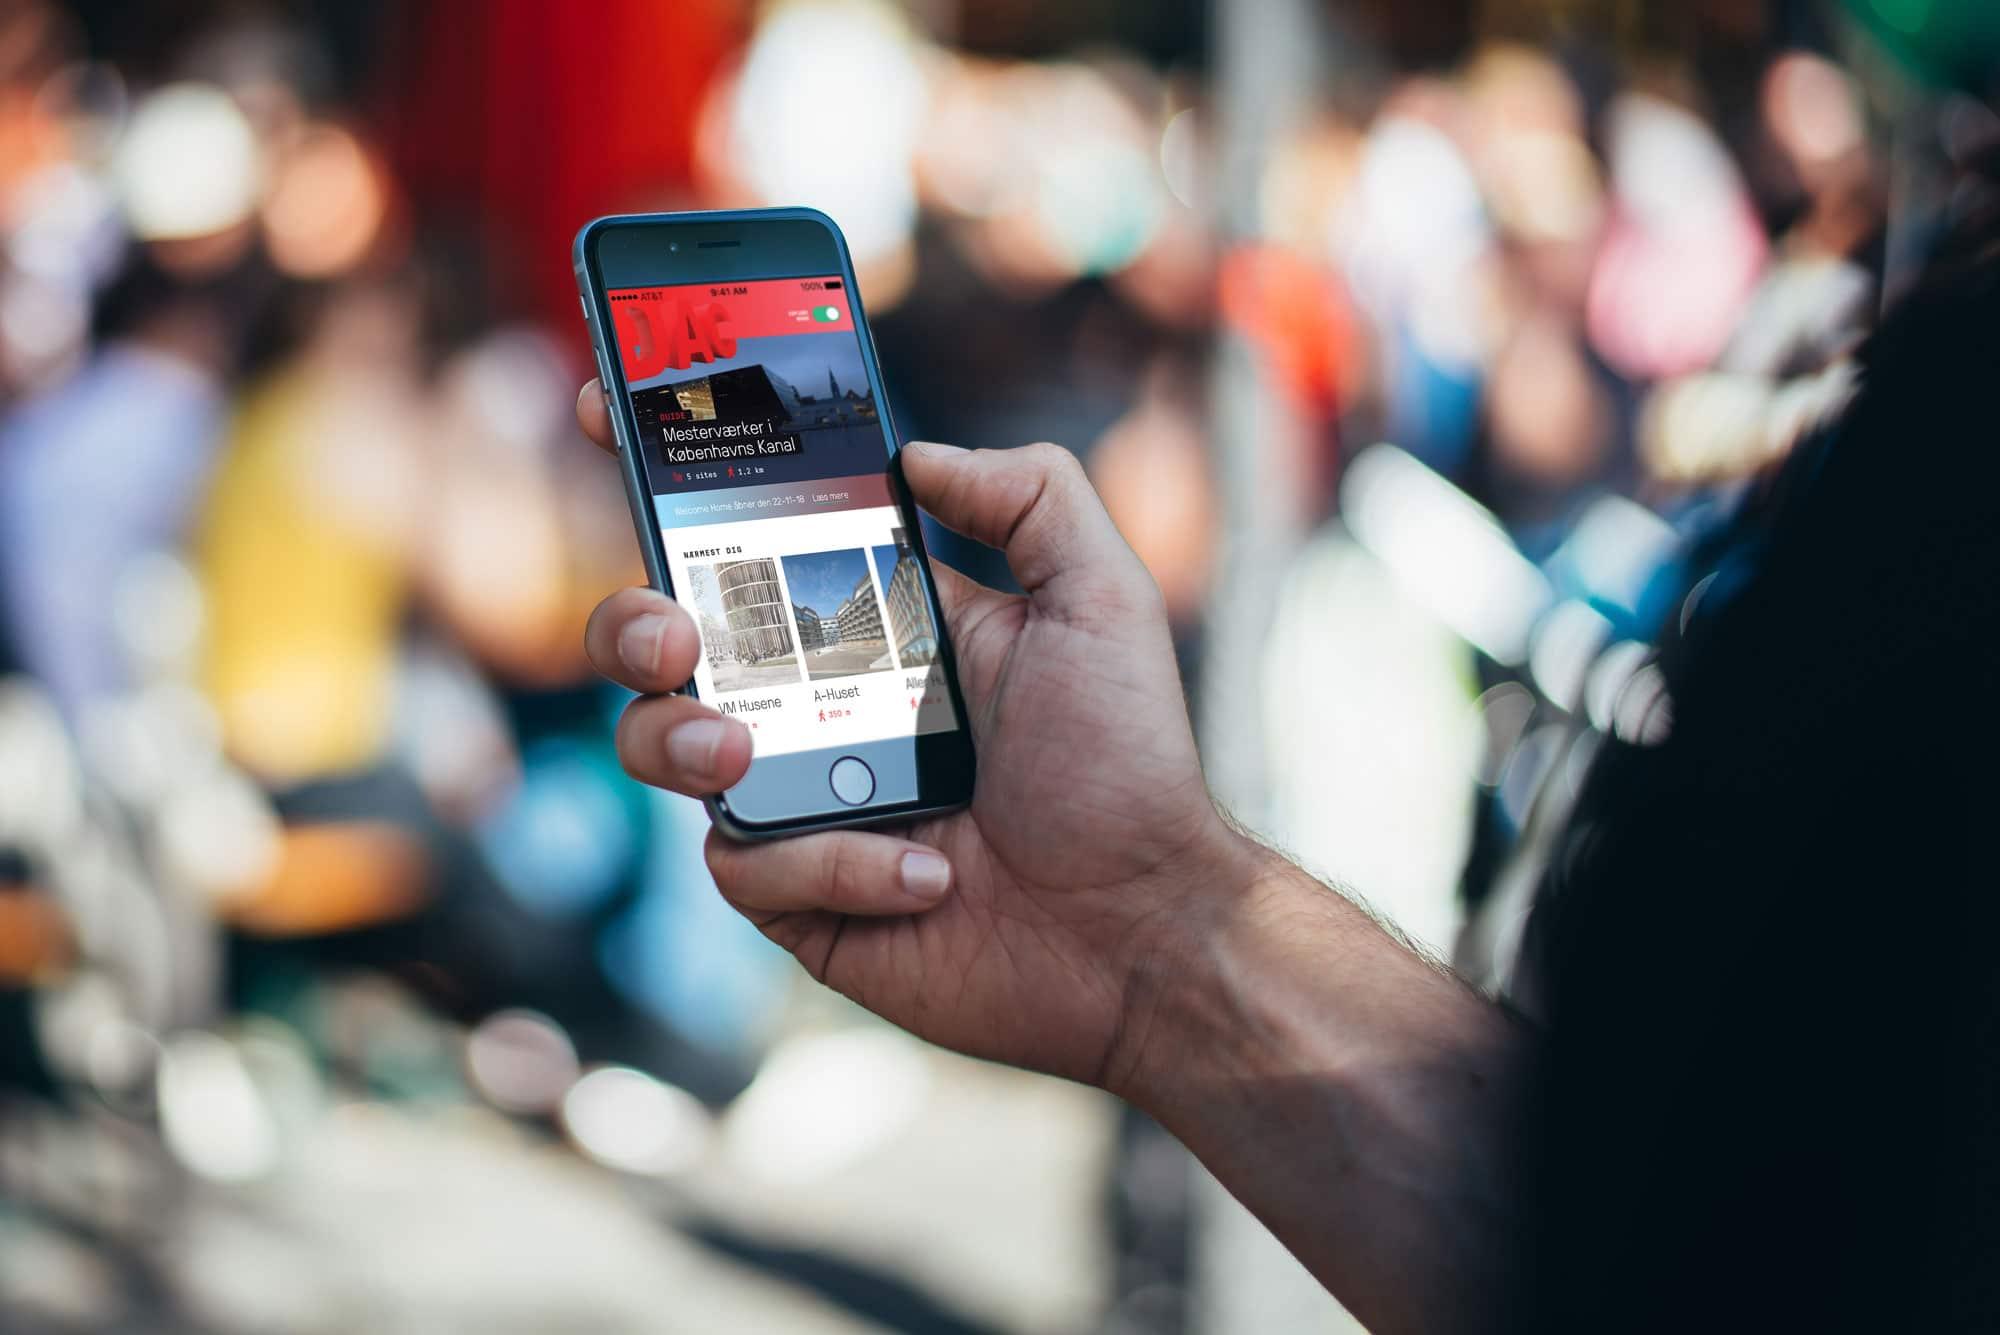 https://dac.dk/en/explore/guided-tours/app/